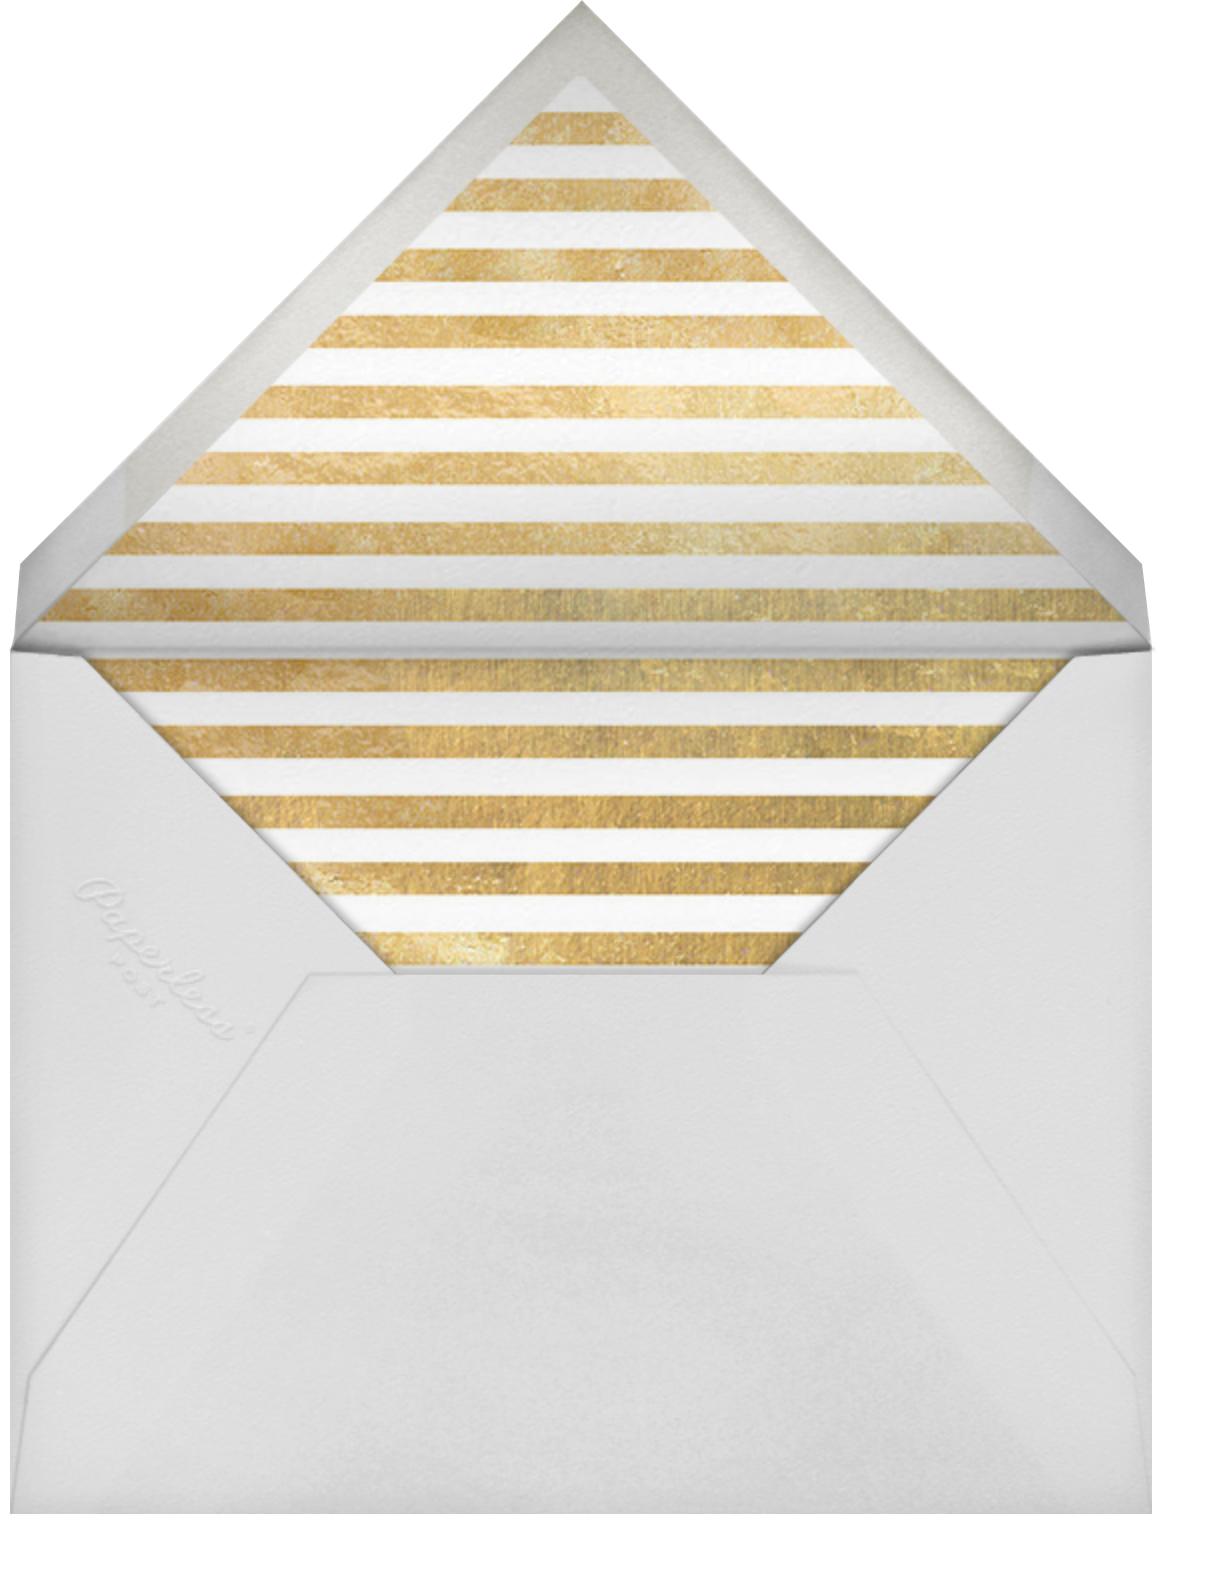 Confetti (Square) - Black - kate spade new york - Adult birthday - envelope back